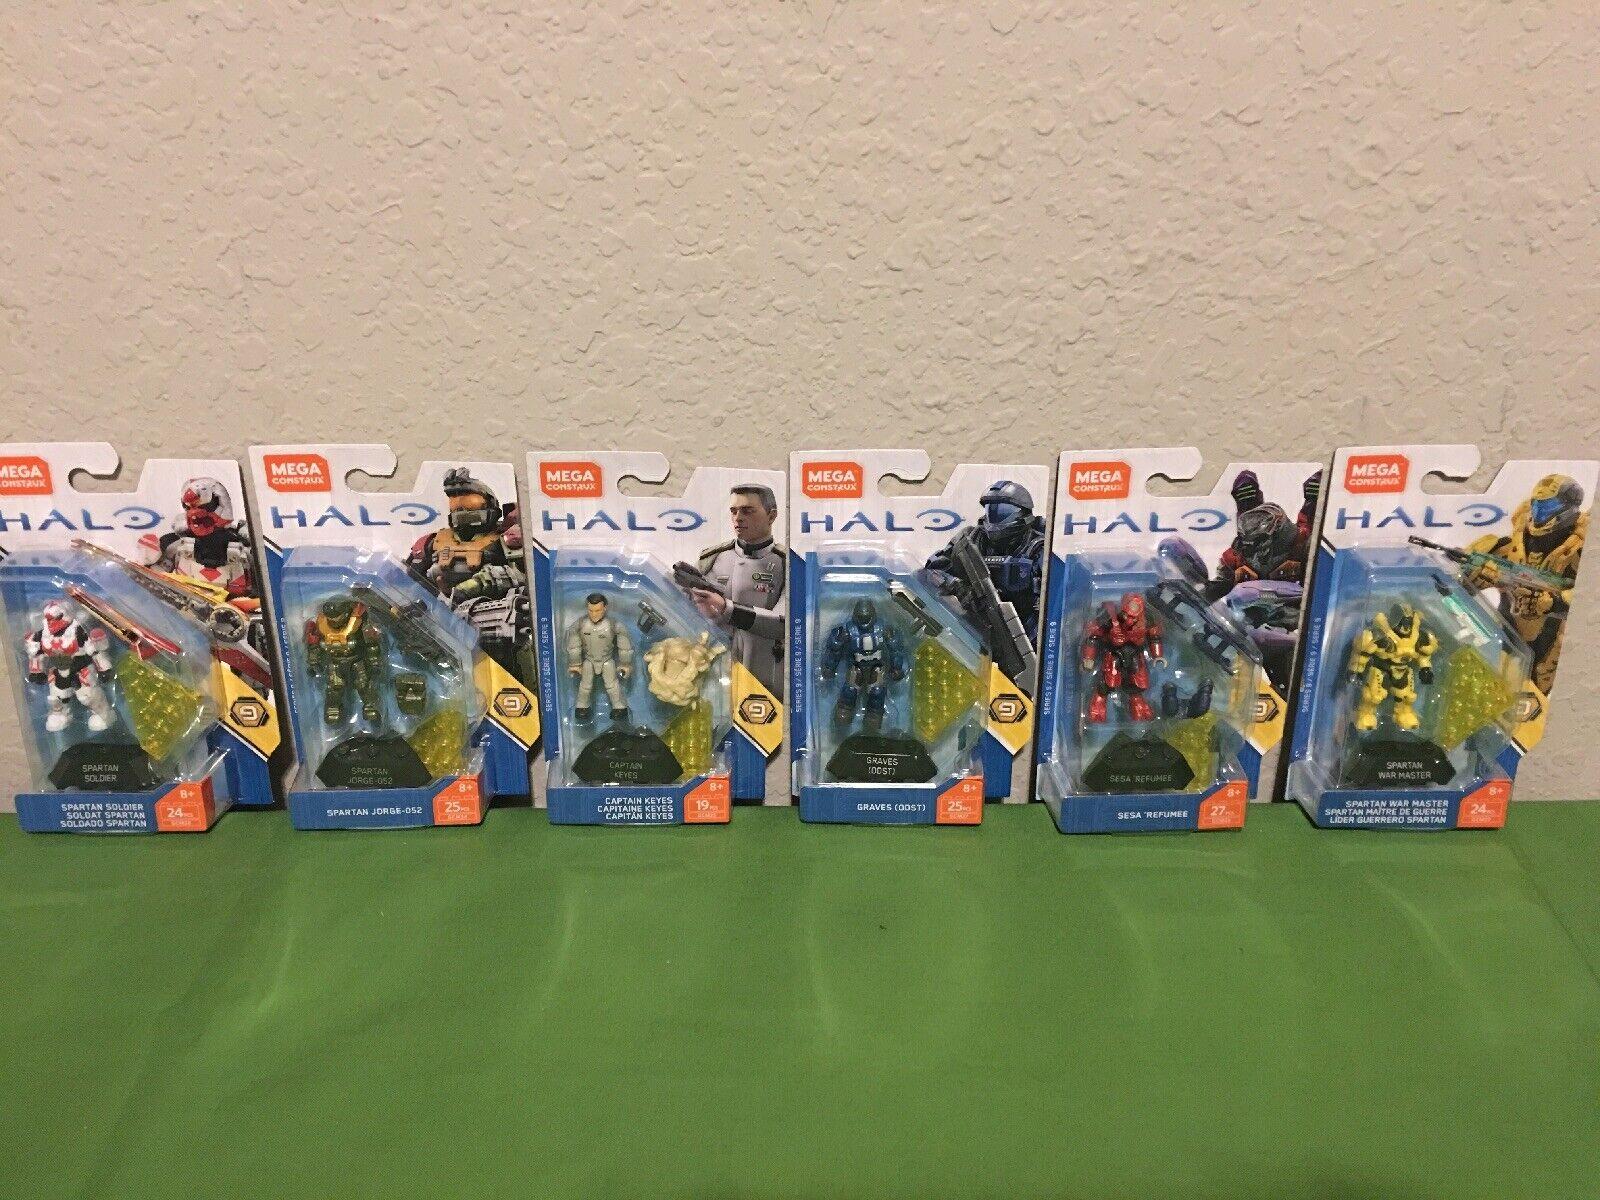 Mega Construx Halo Heroes series 9 Complete Set Of 6 New.   CPT Keyes, Jorge-052